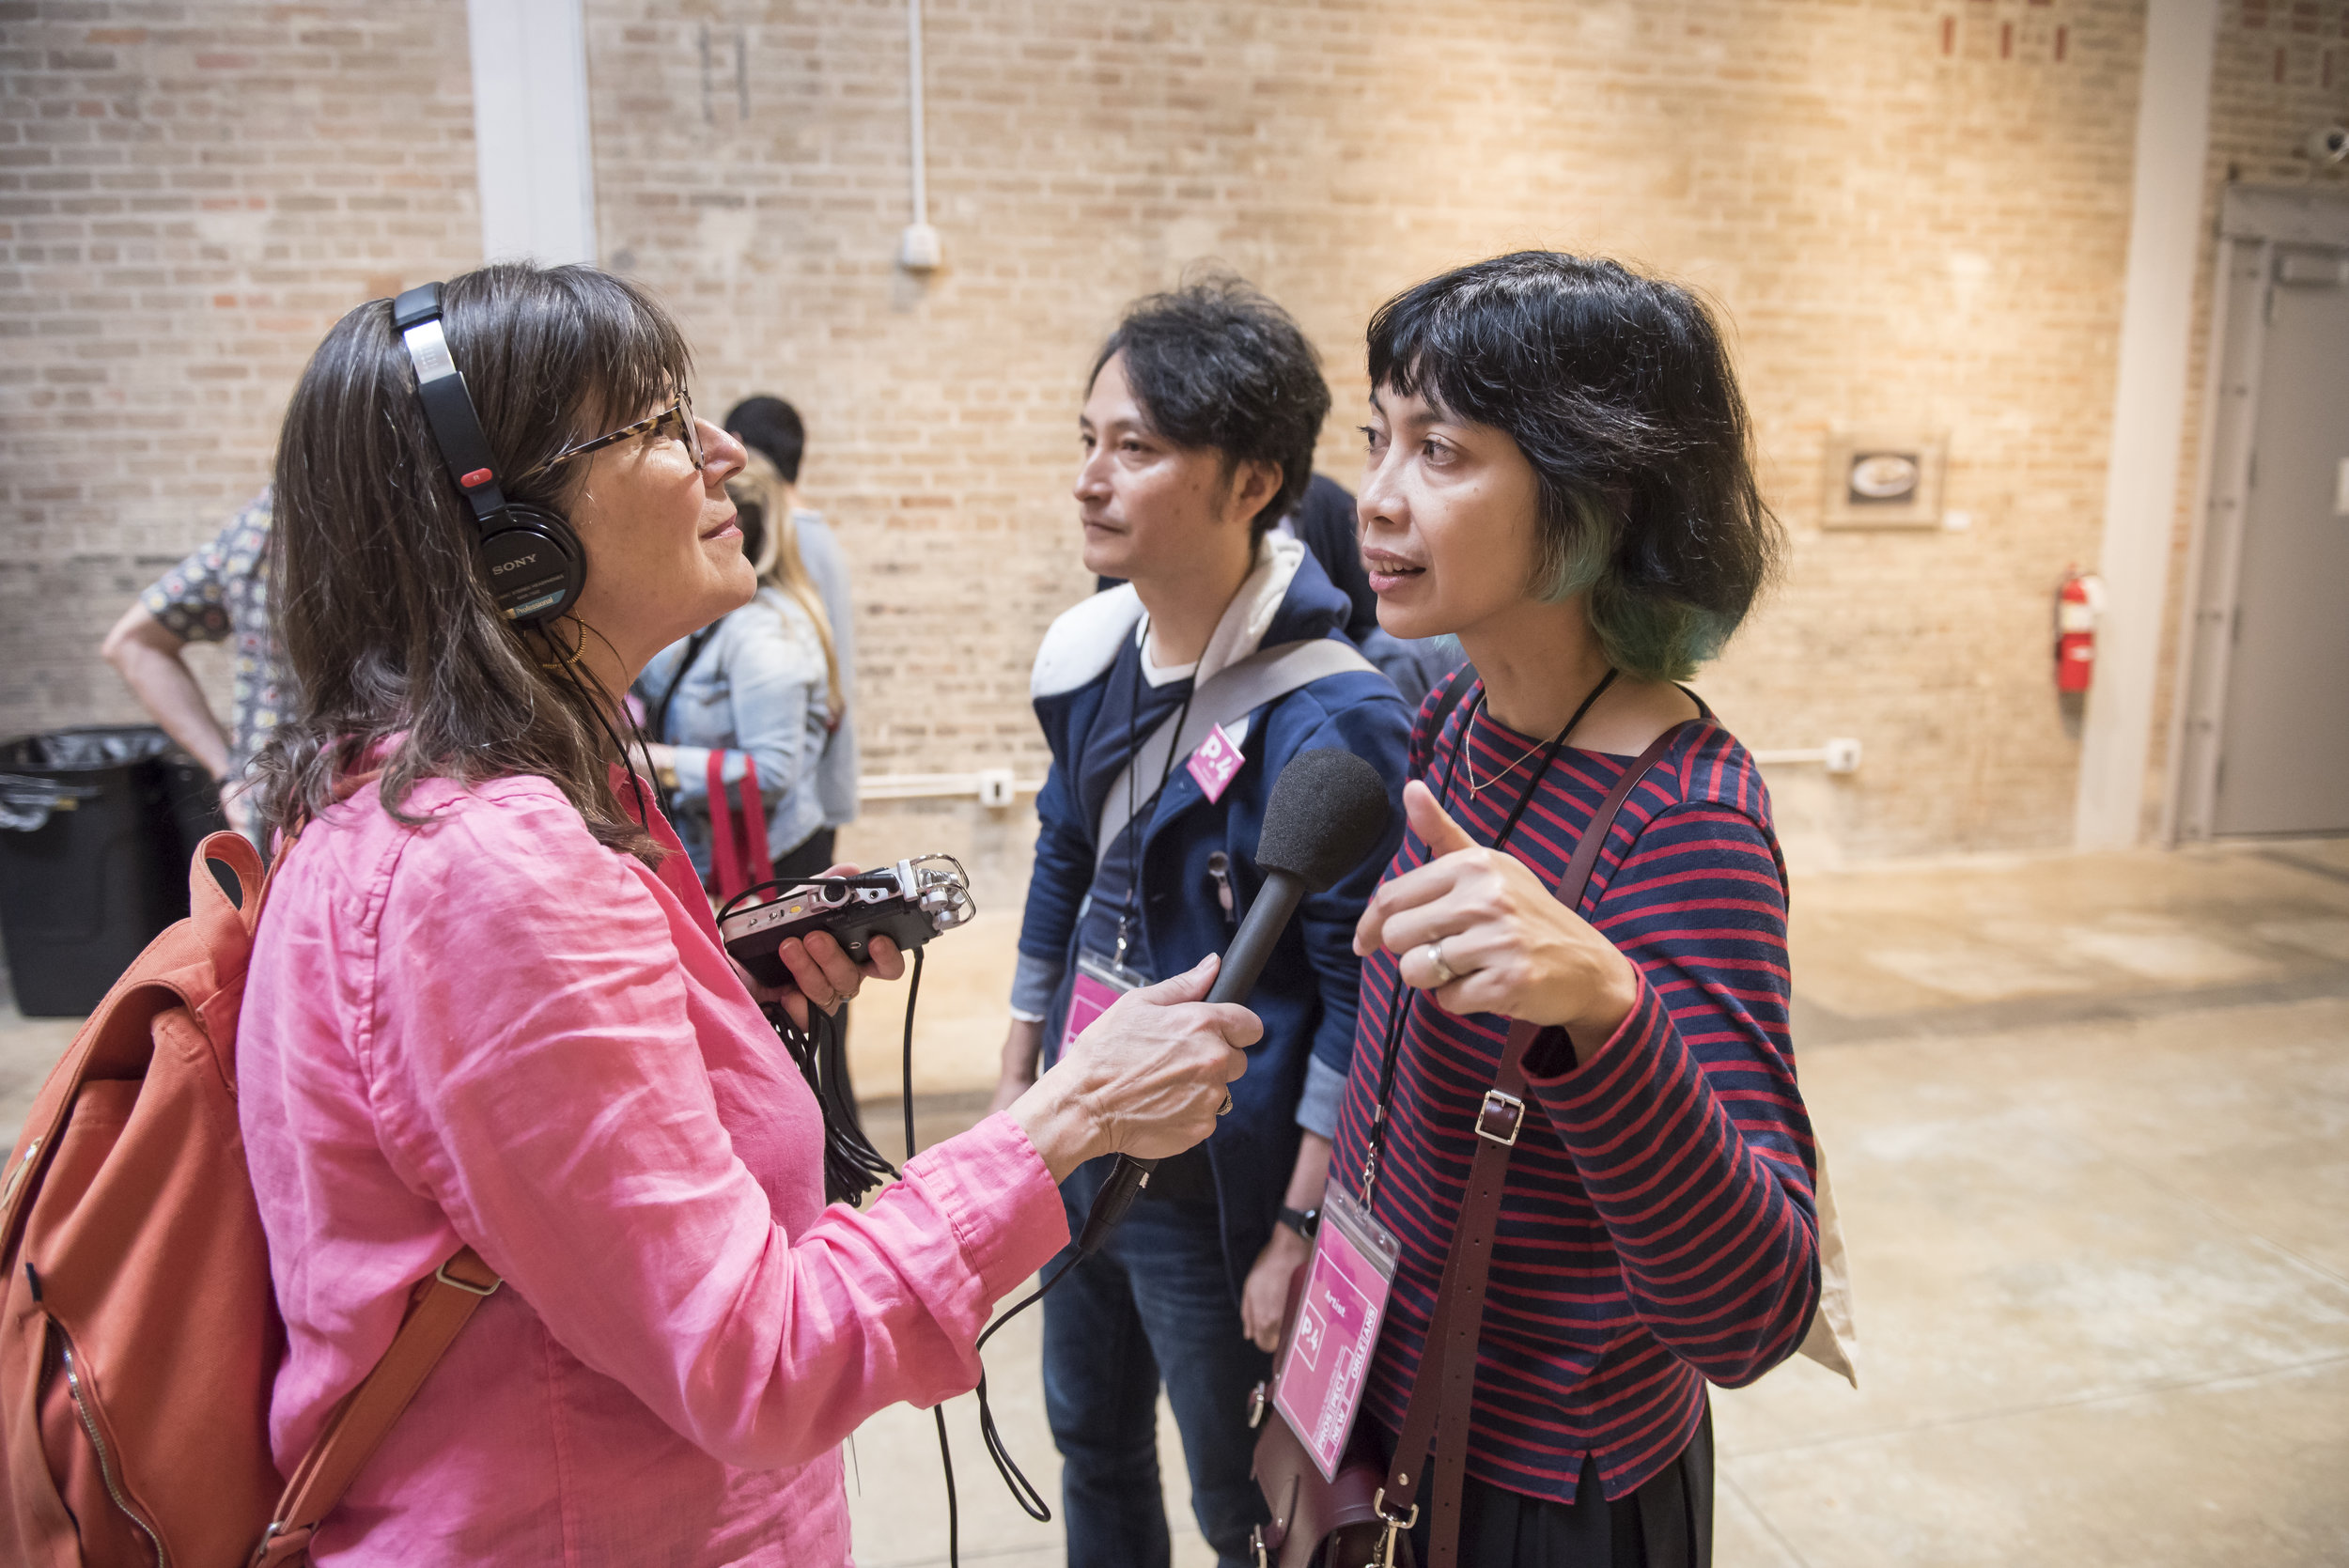 Davia Nelson with Taiyo Kimura & Tita Salina